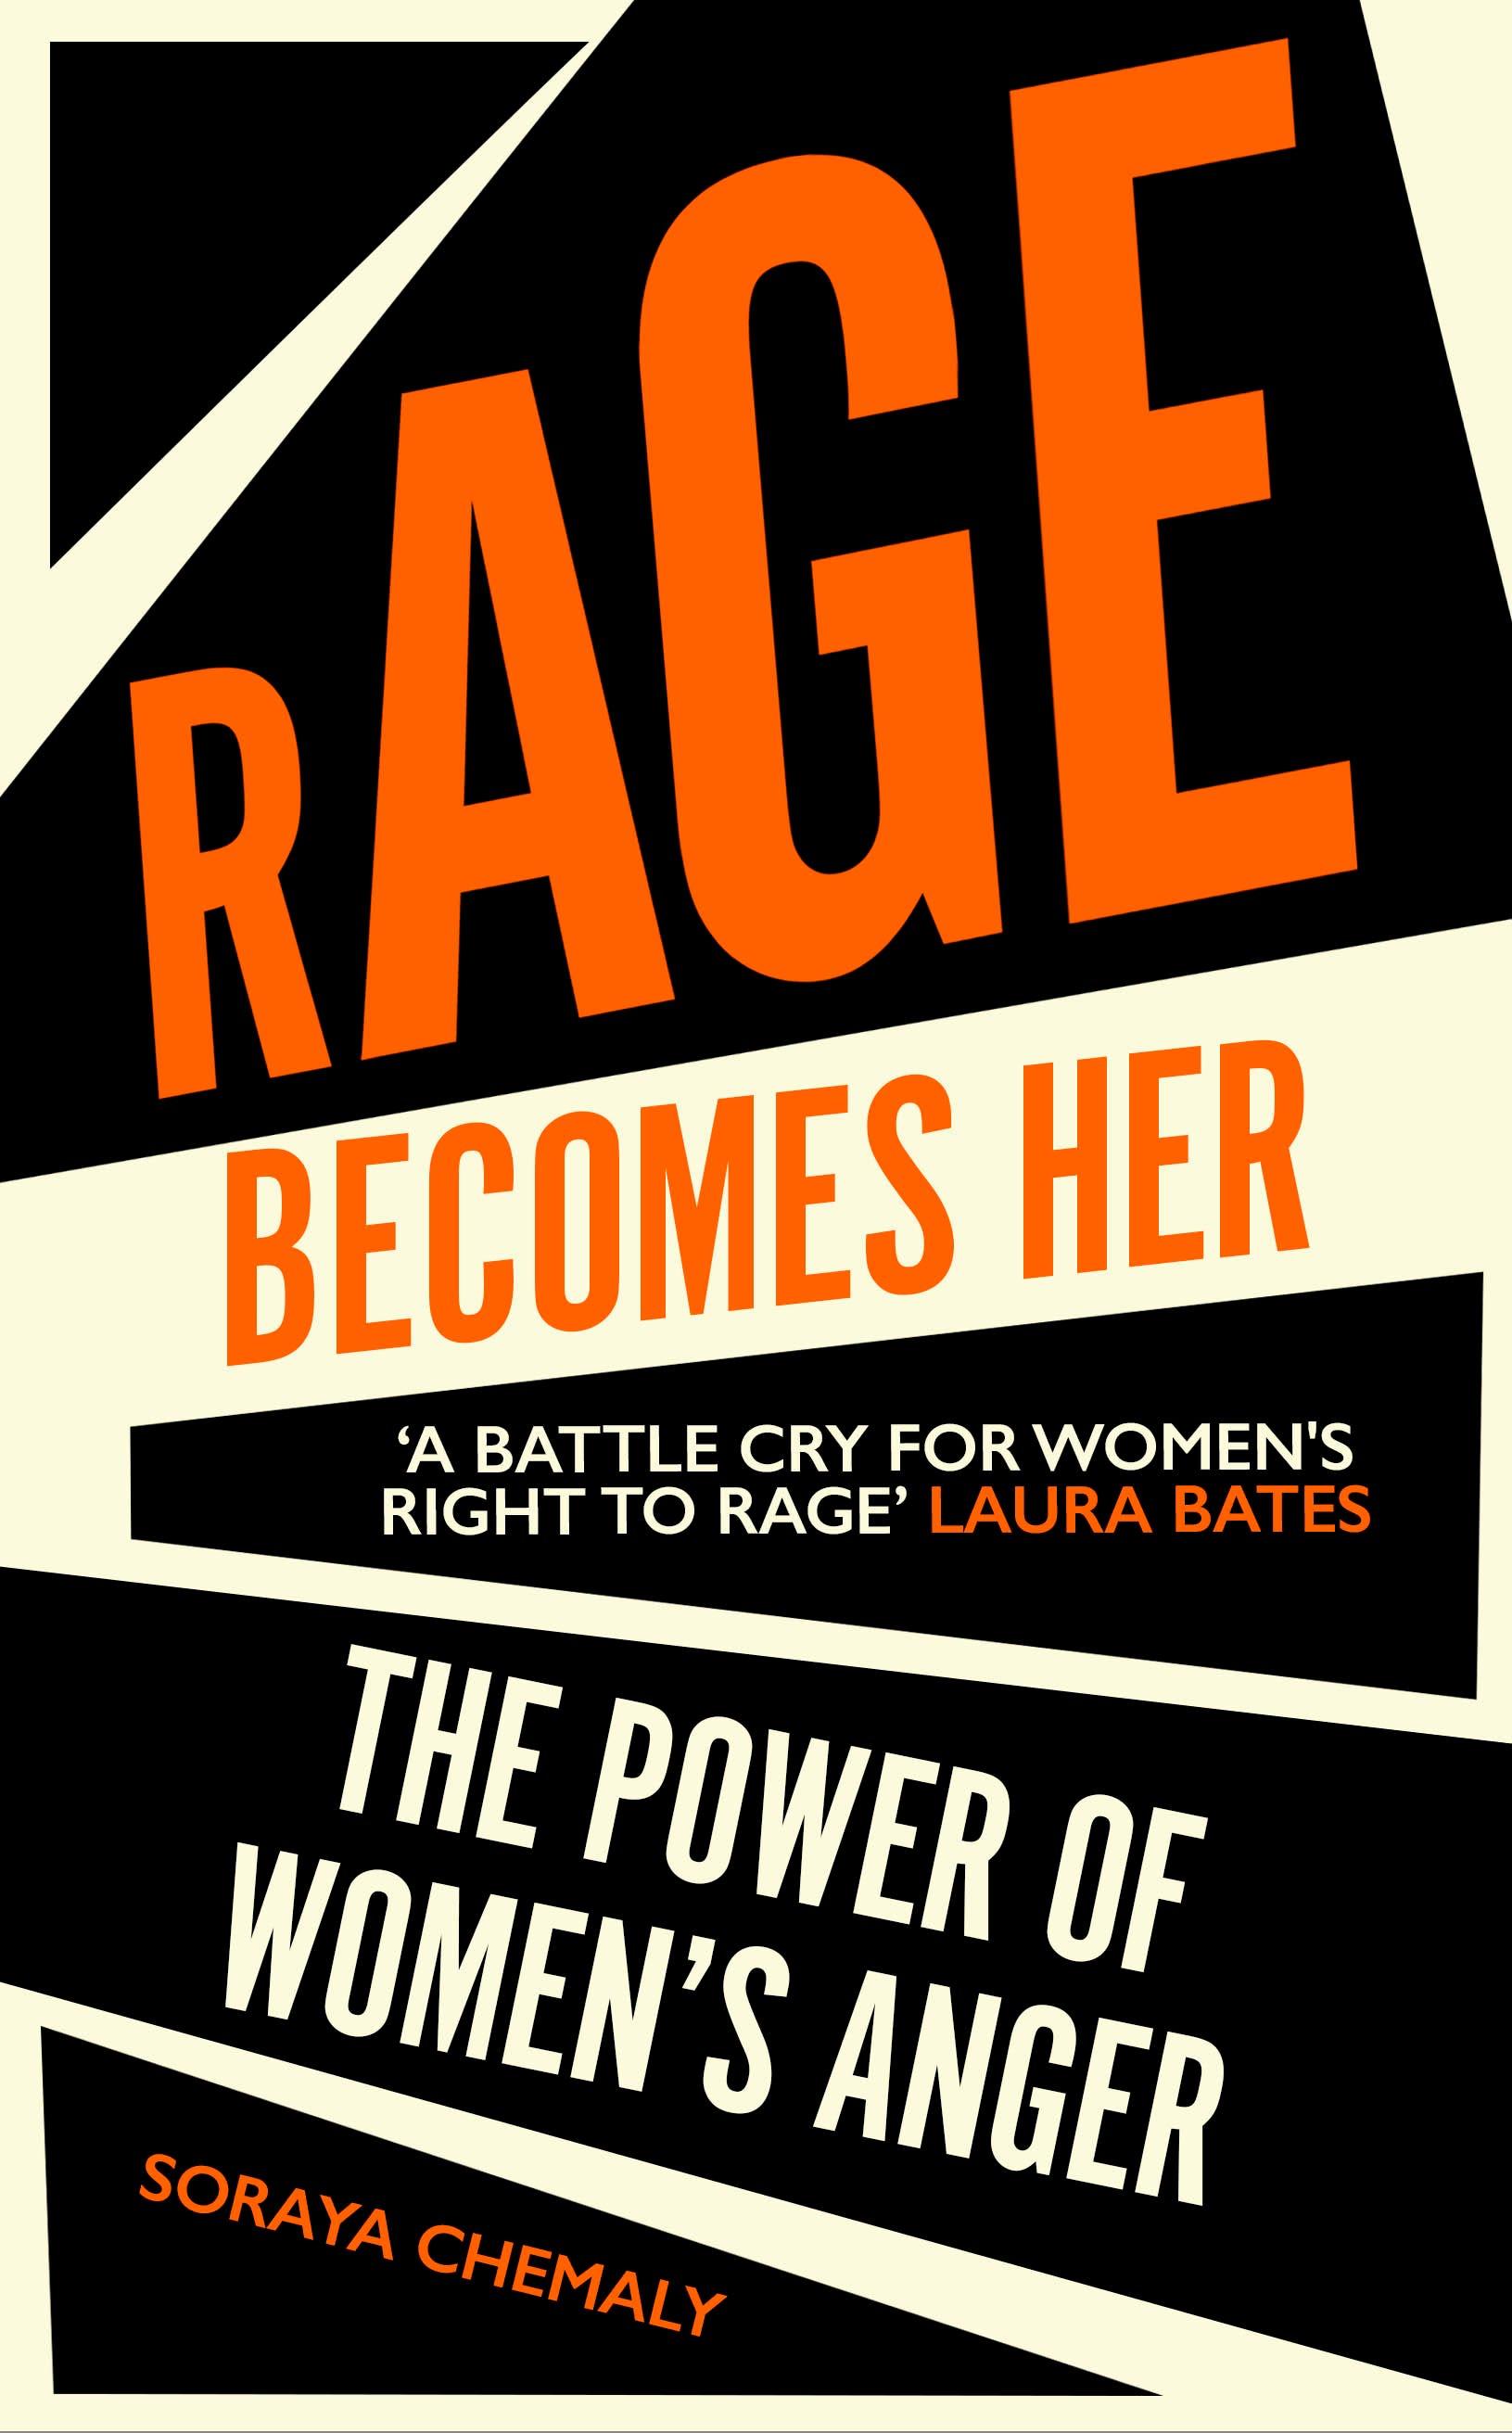 Self invalidating womens anger